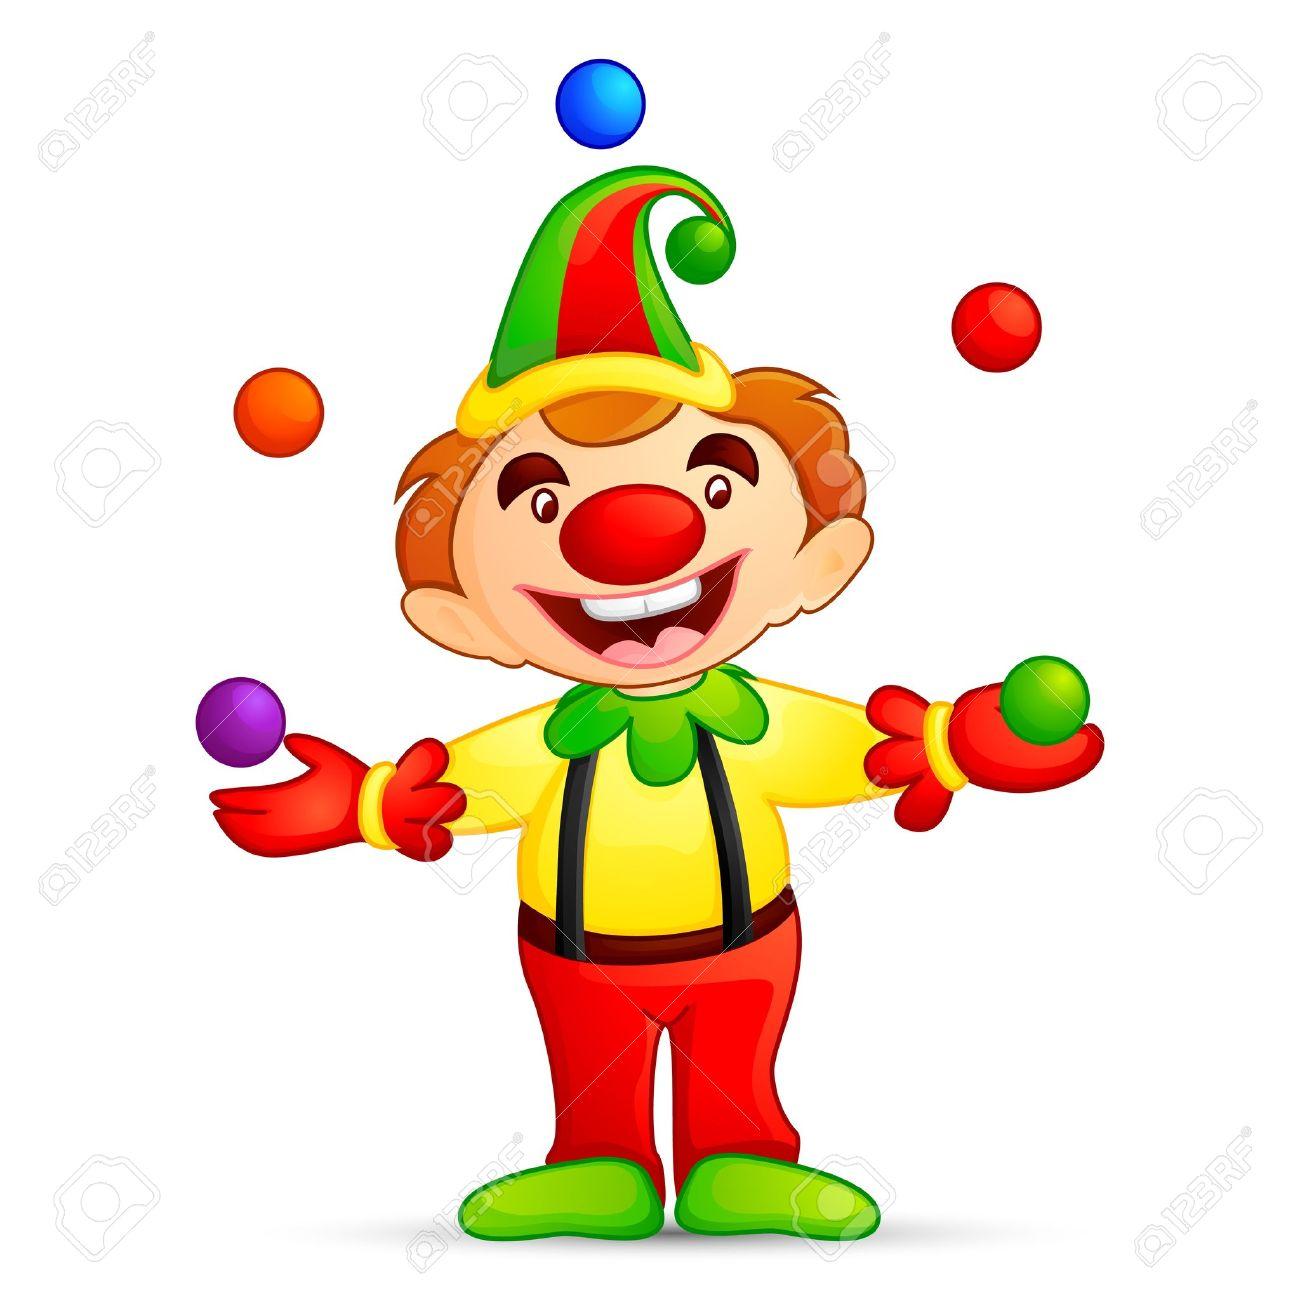 Circus juggler clipart 7 » Clipart Station.